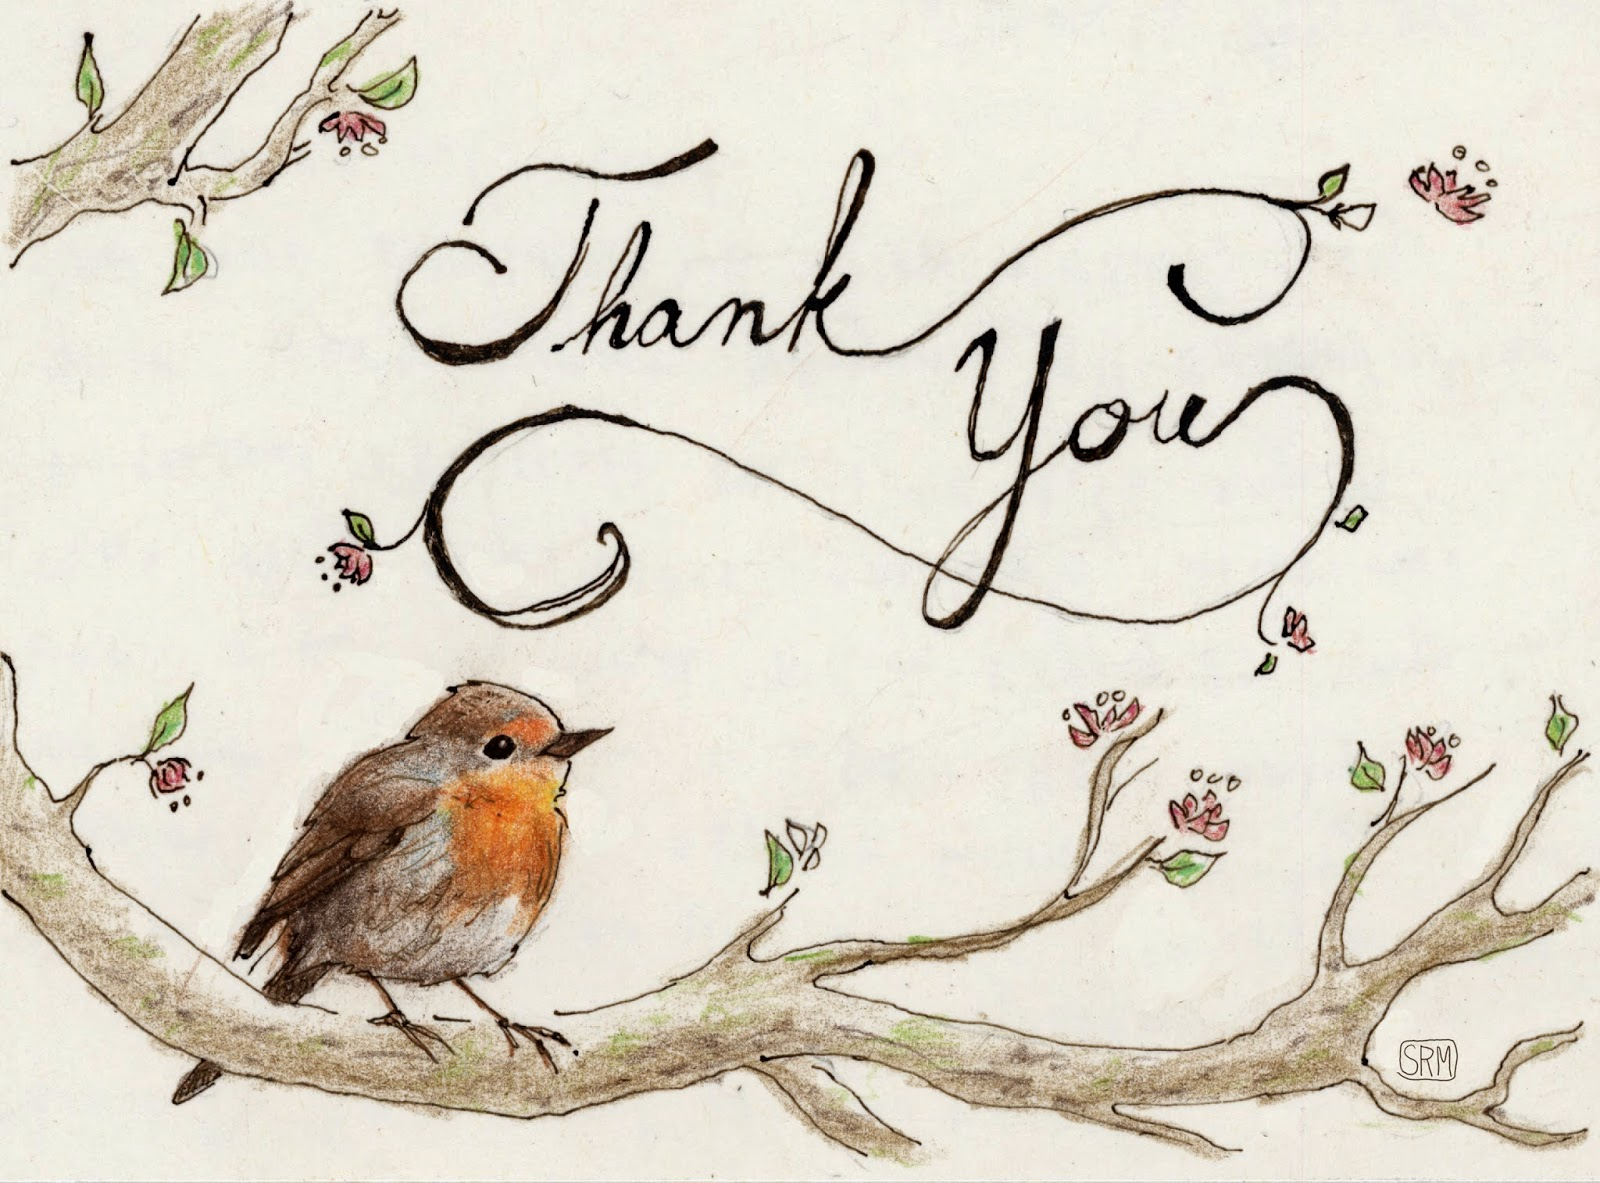 http://sarahmccormickdesign.com/wp-content/uploads/2014/05/Thank You 1.jpg